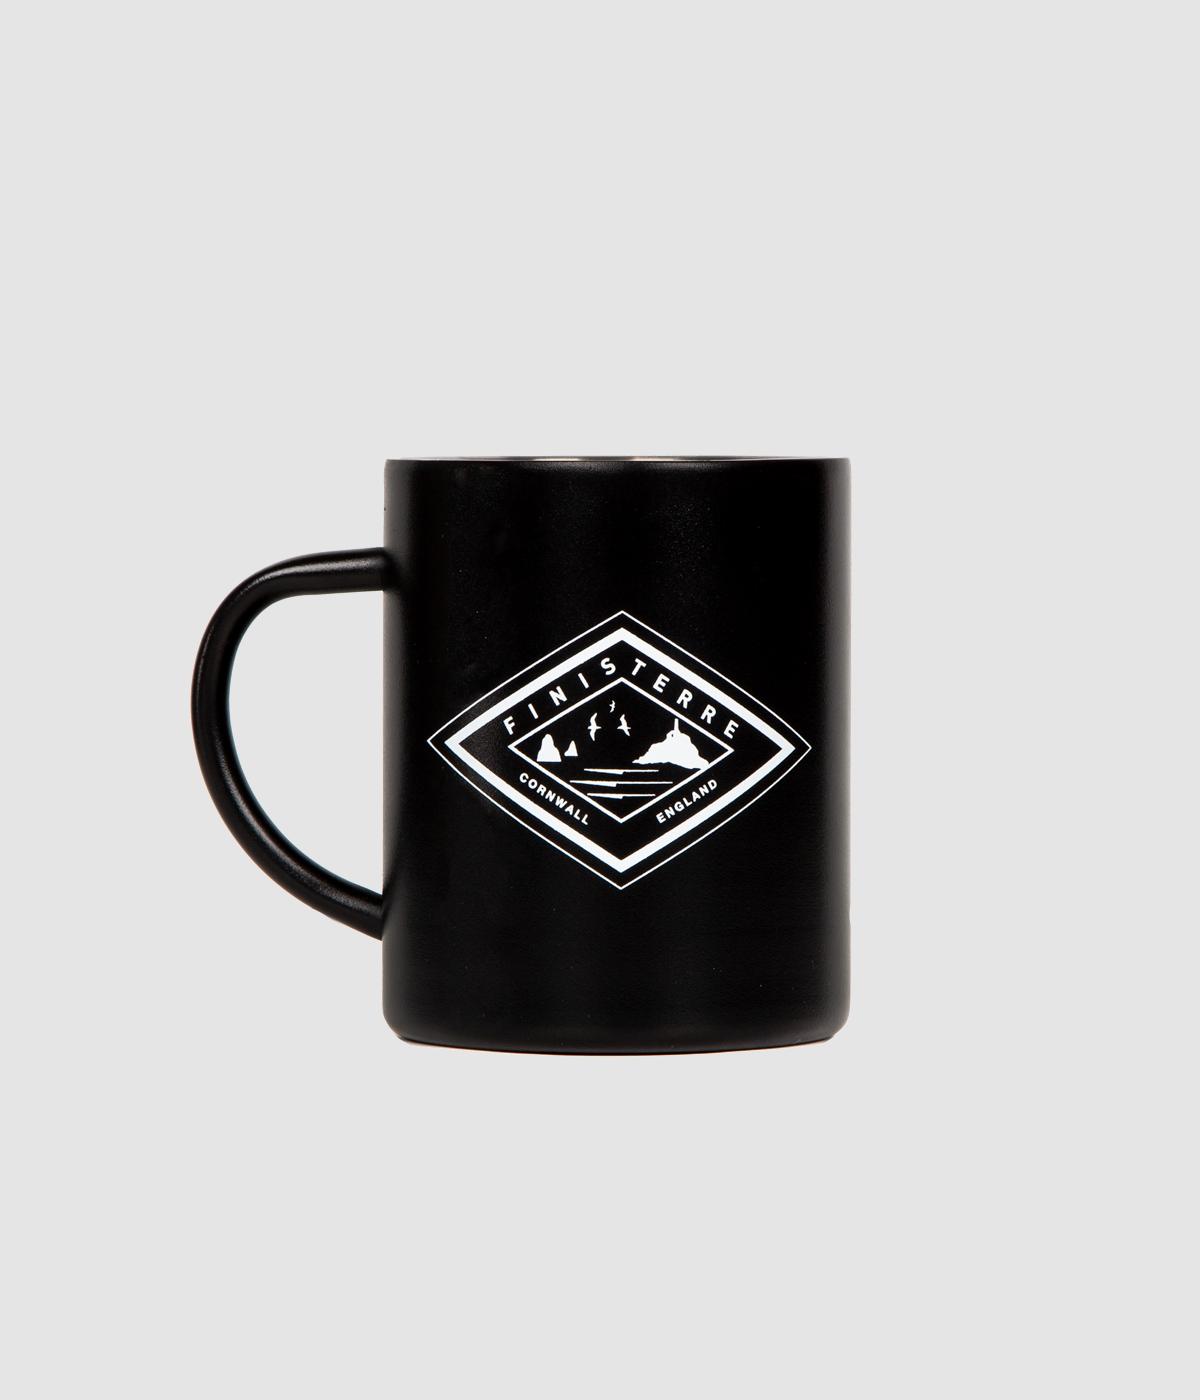 Mizu + Finisterre Mug